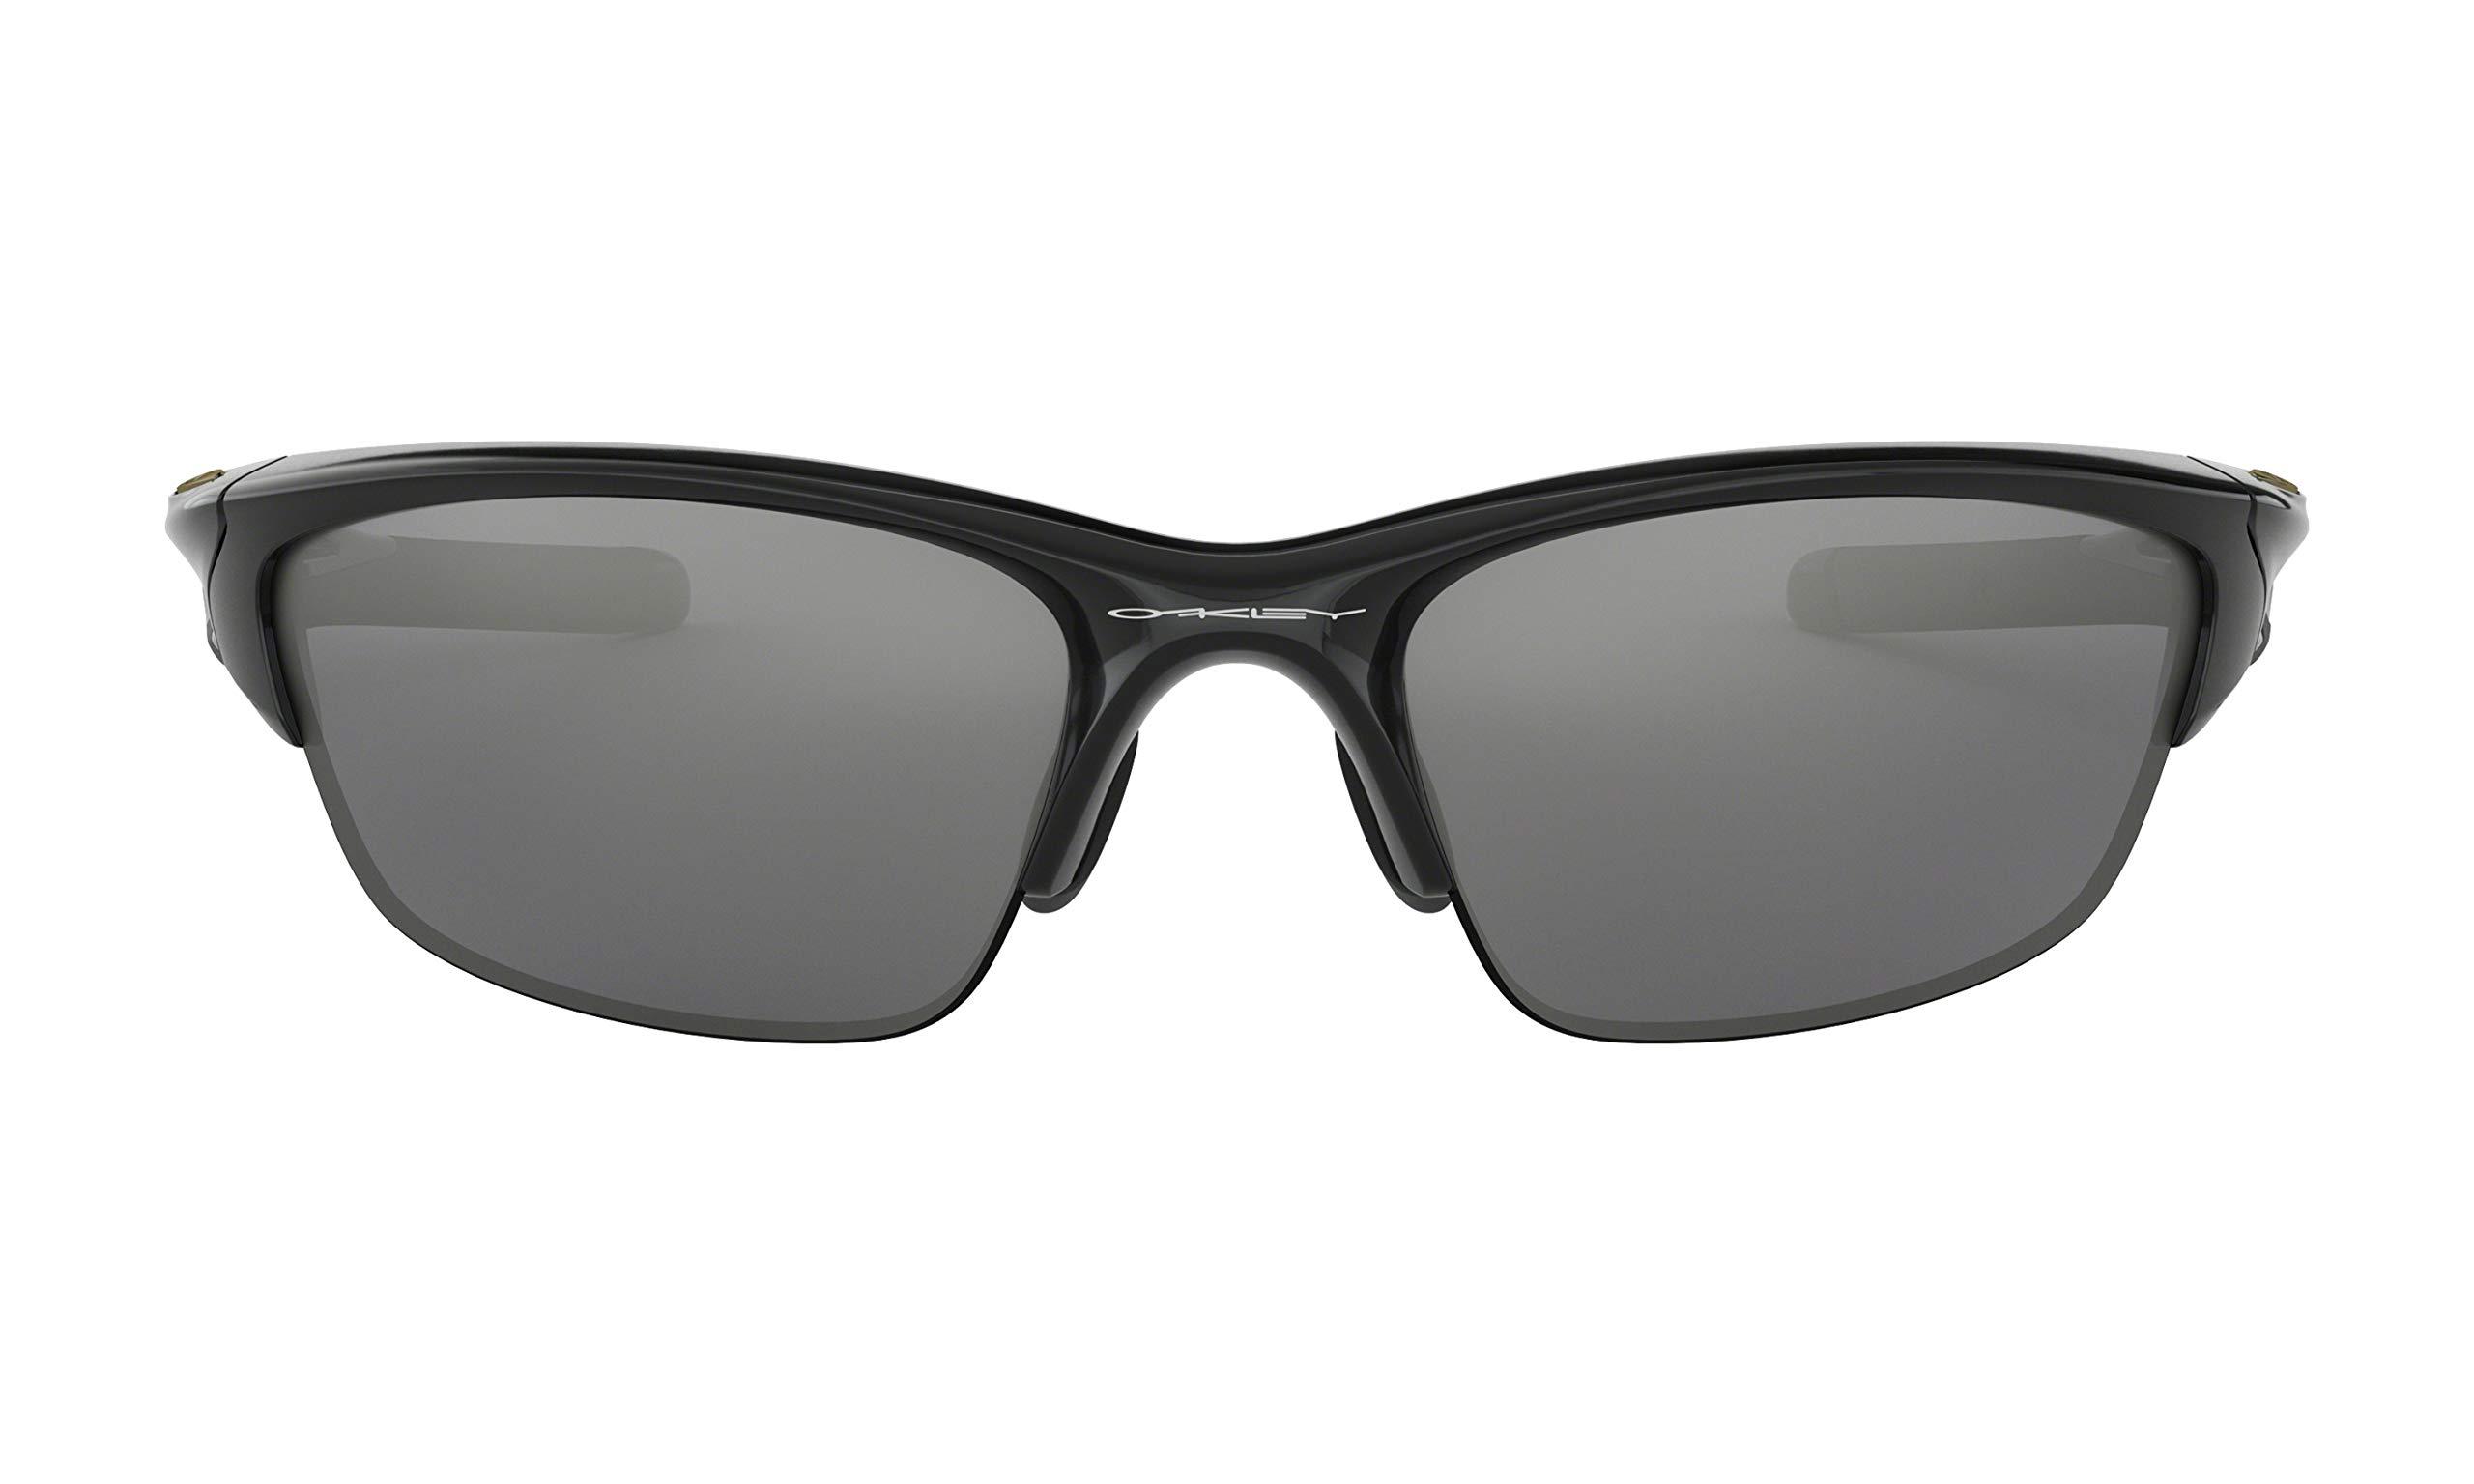 Oakley Half Jacket 2.0 Sunglasses (Polished Black Frame, Black Iridium Lens) with Lens Cleaning Kit and Ellipse O Carbonfiber Hard Case by Oakley